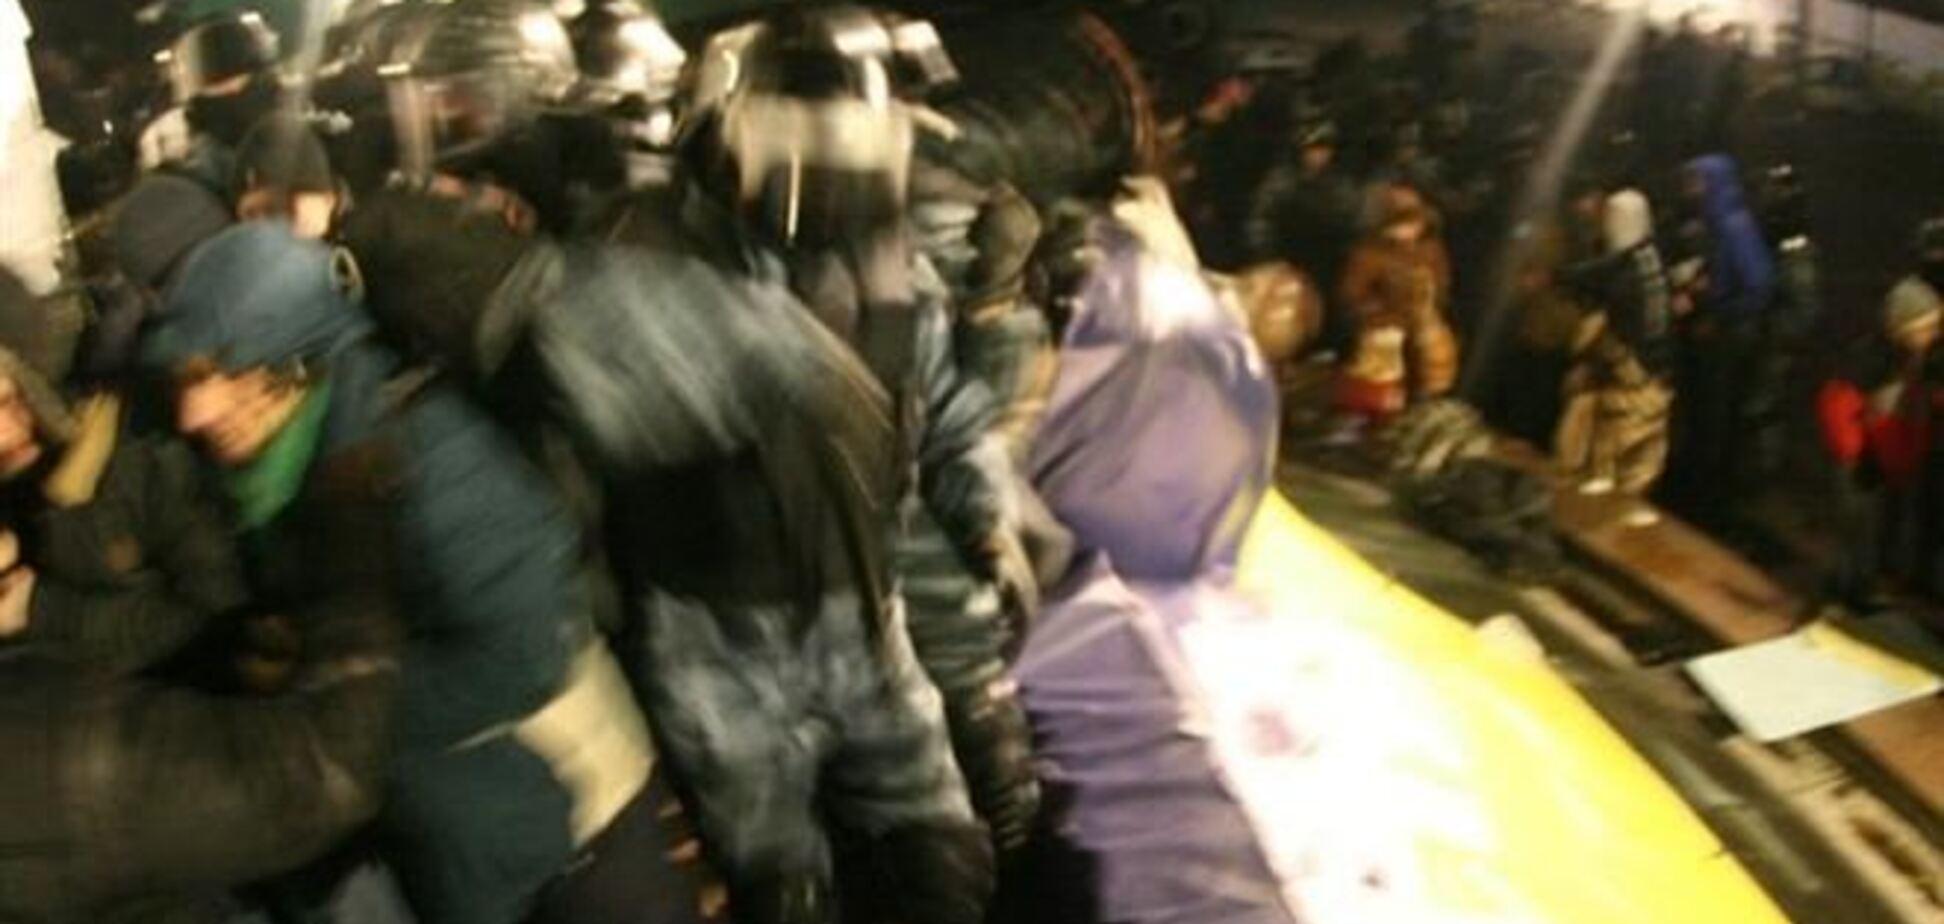 'Беркут' догонял и избивал людей за полкилометра от Майдана